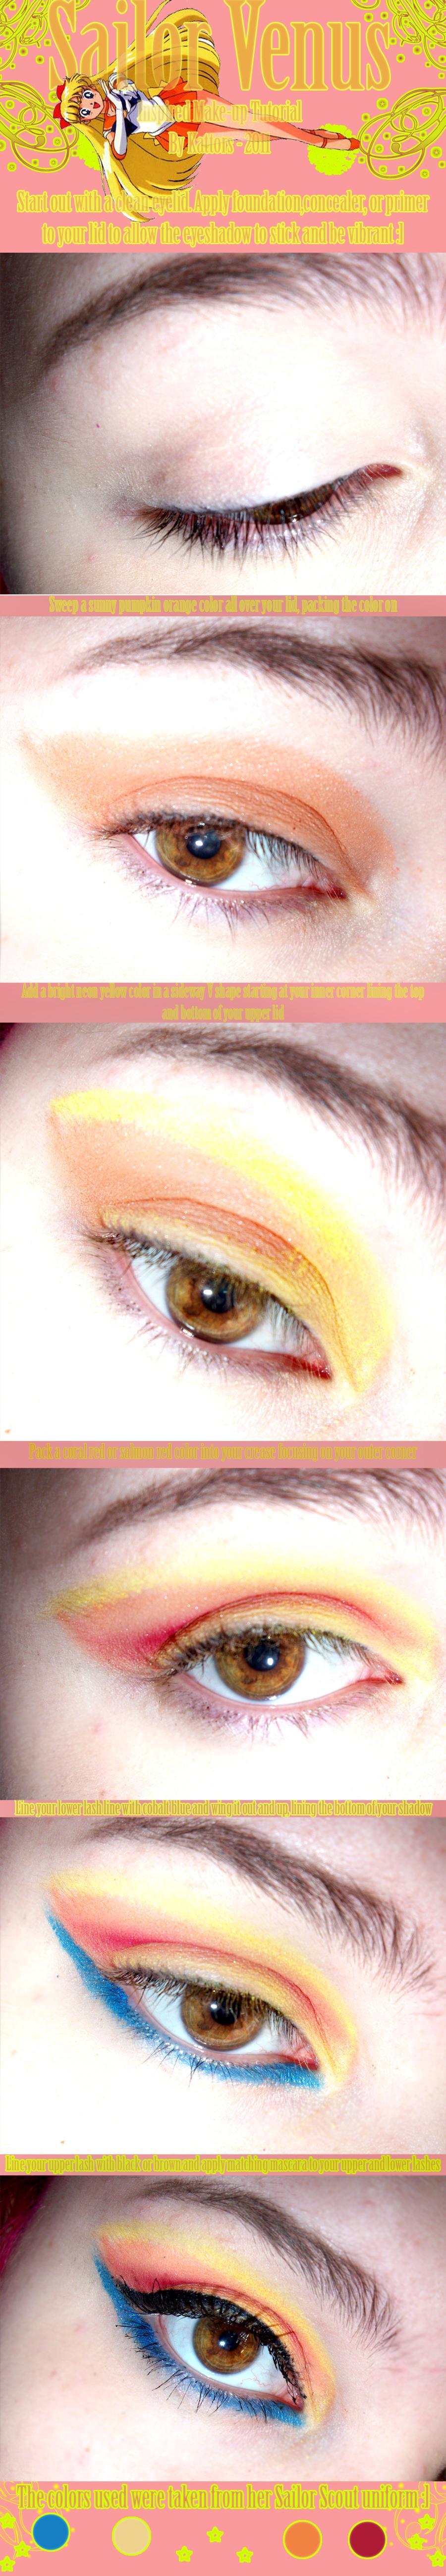 Sailor Venus Makeup Tutorial